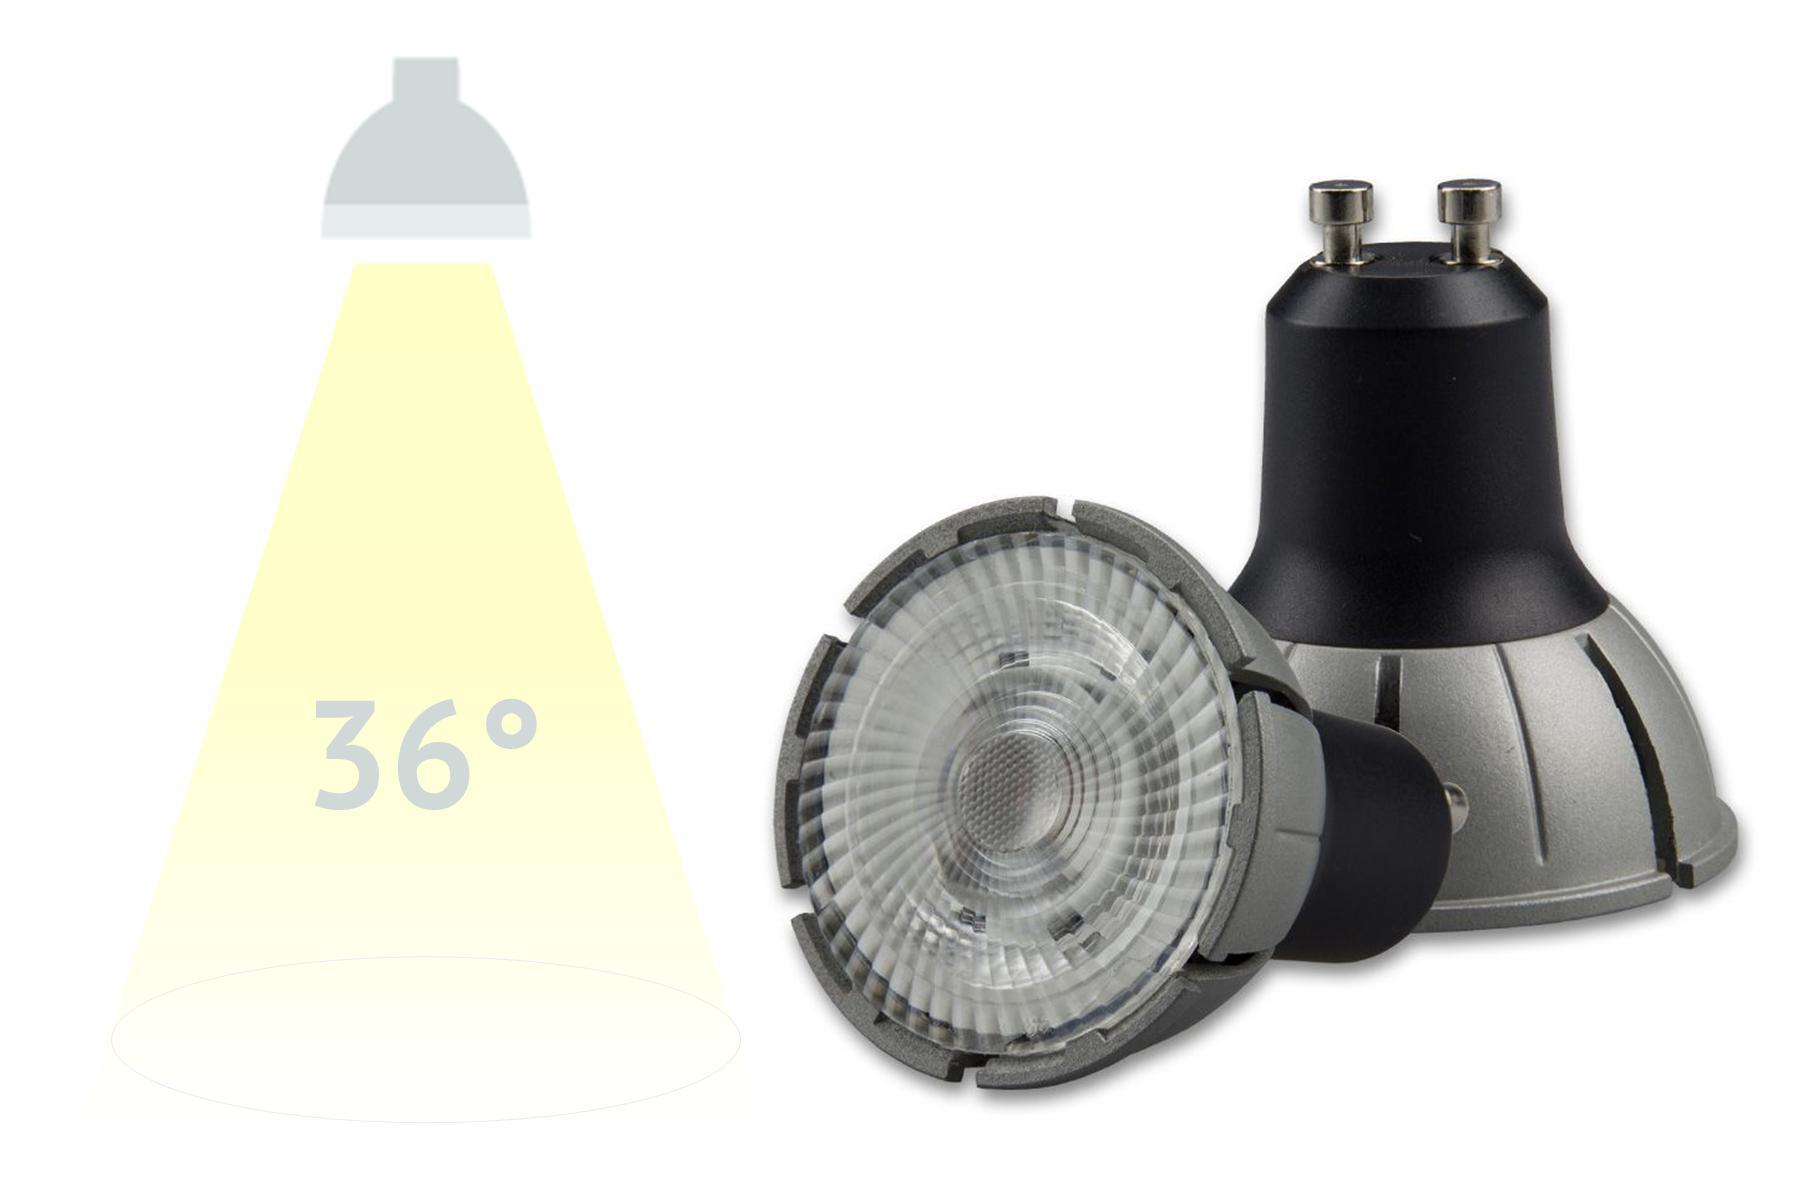 LED-Spot ISOLED, 8W, 36° - 230V GU10